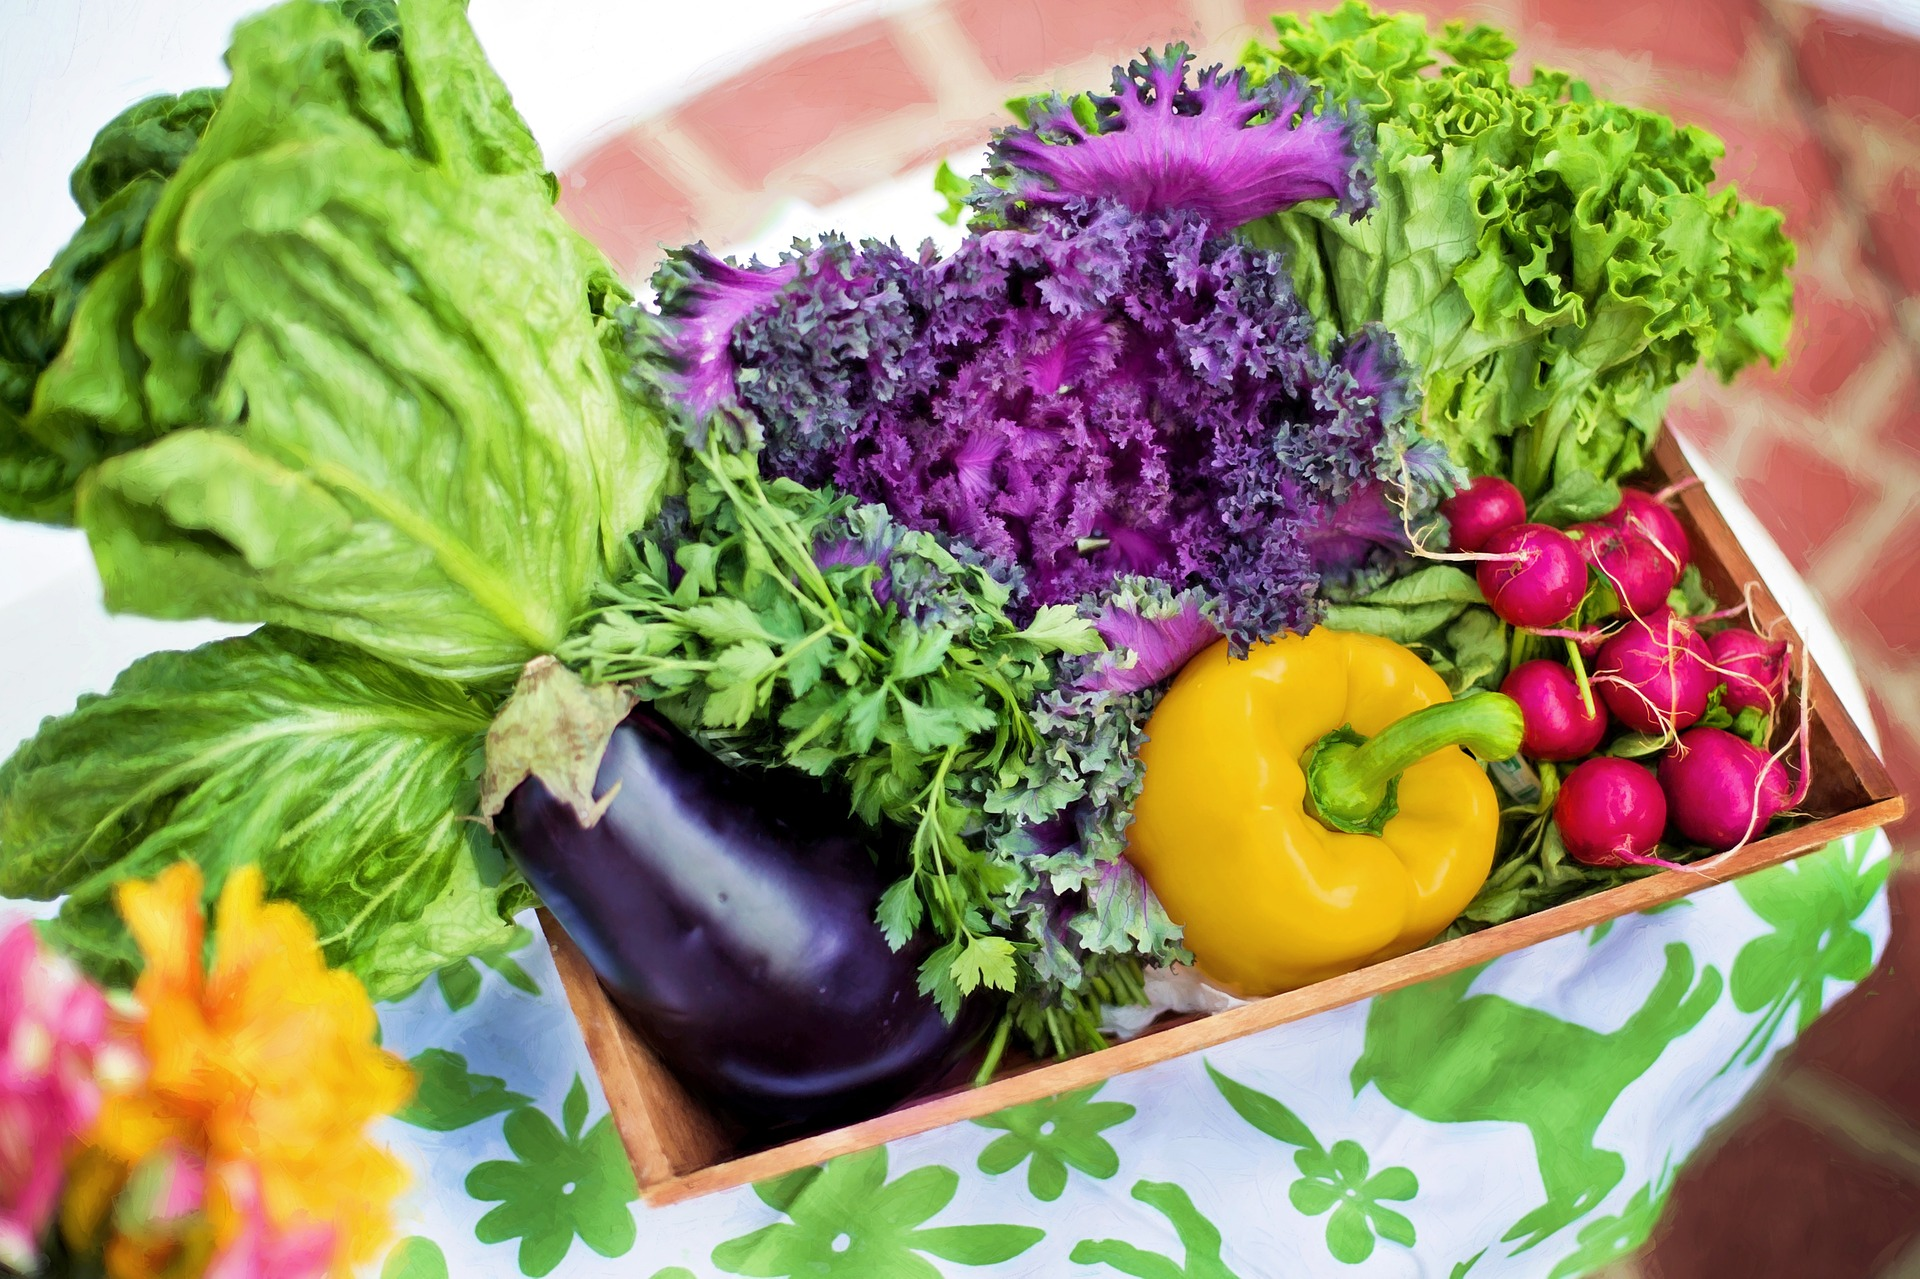 vegetables-790022_1920.jpg